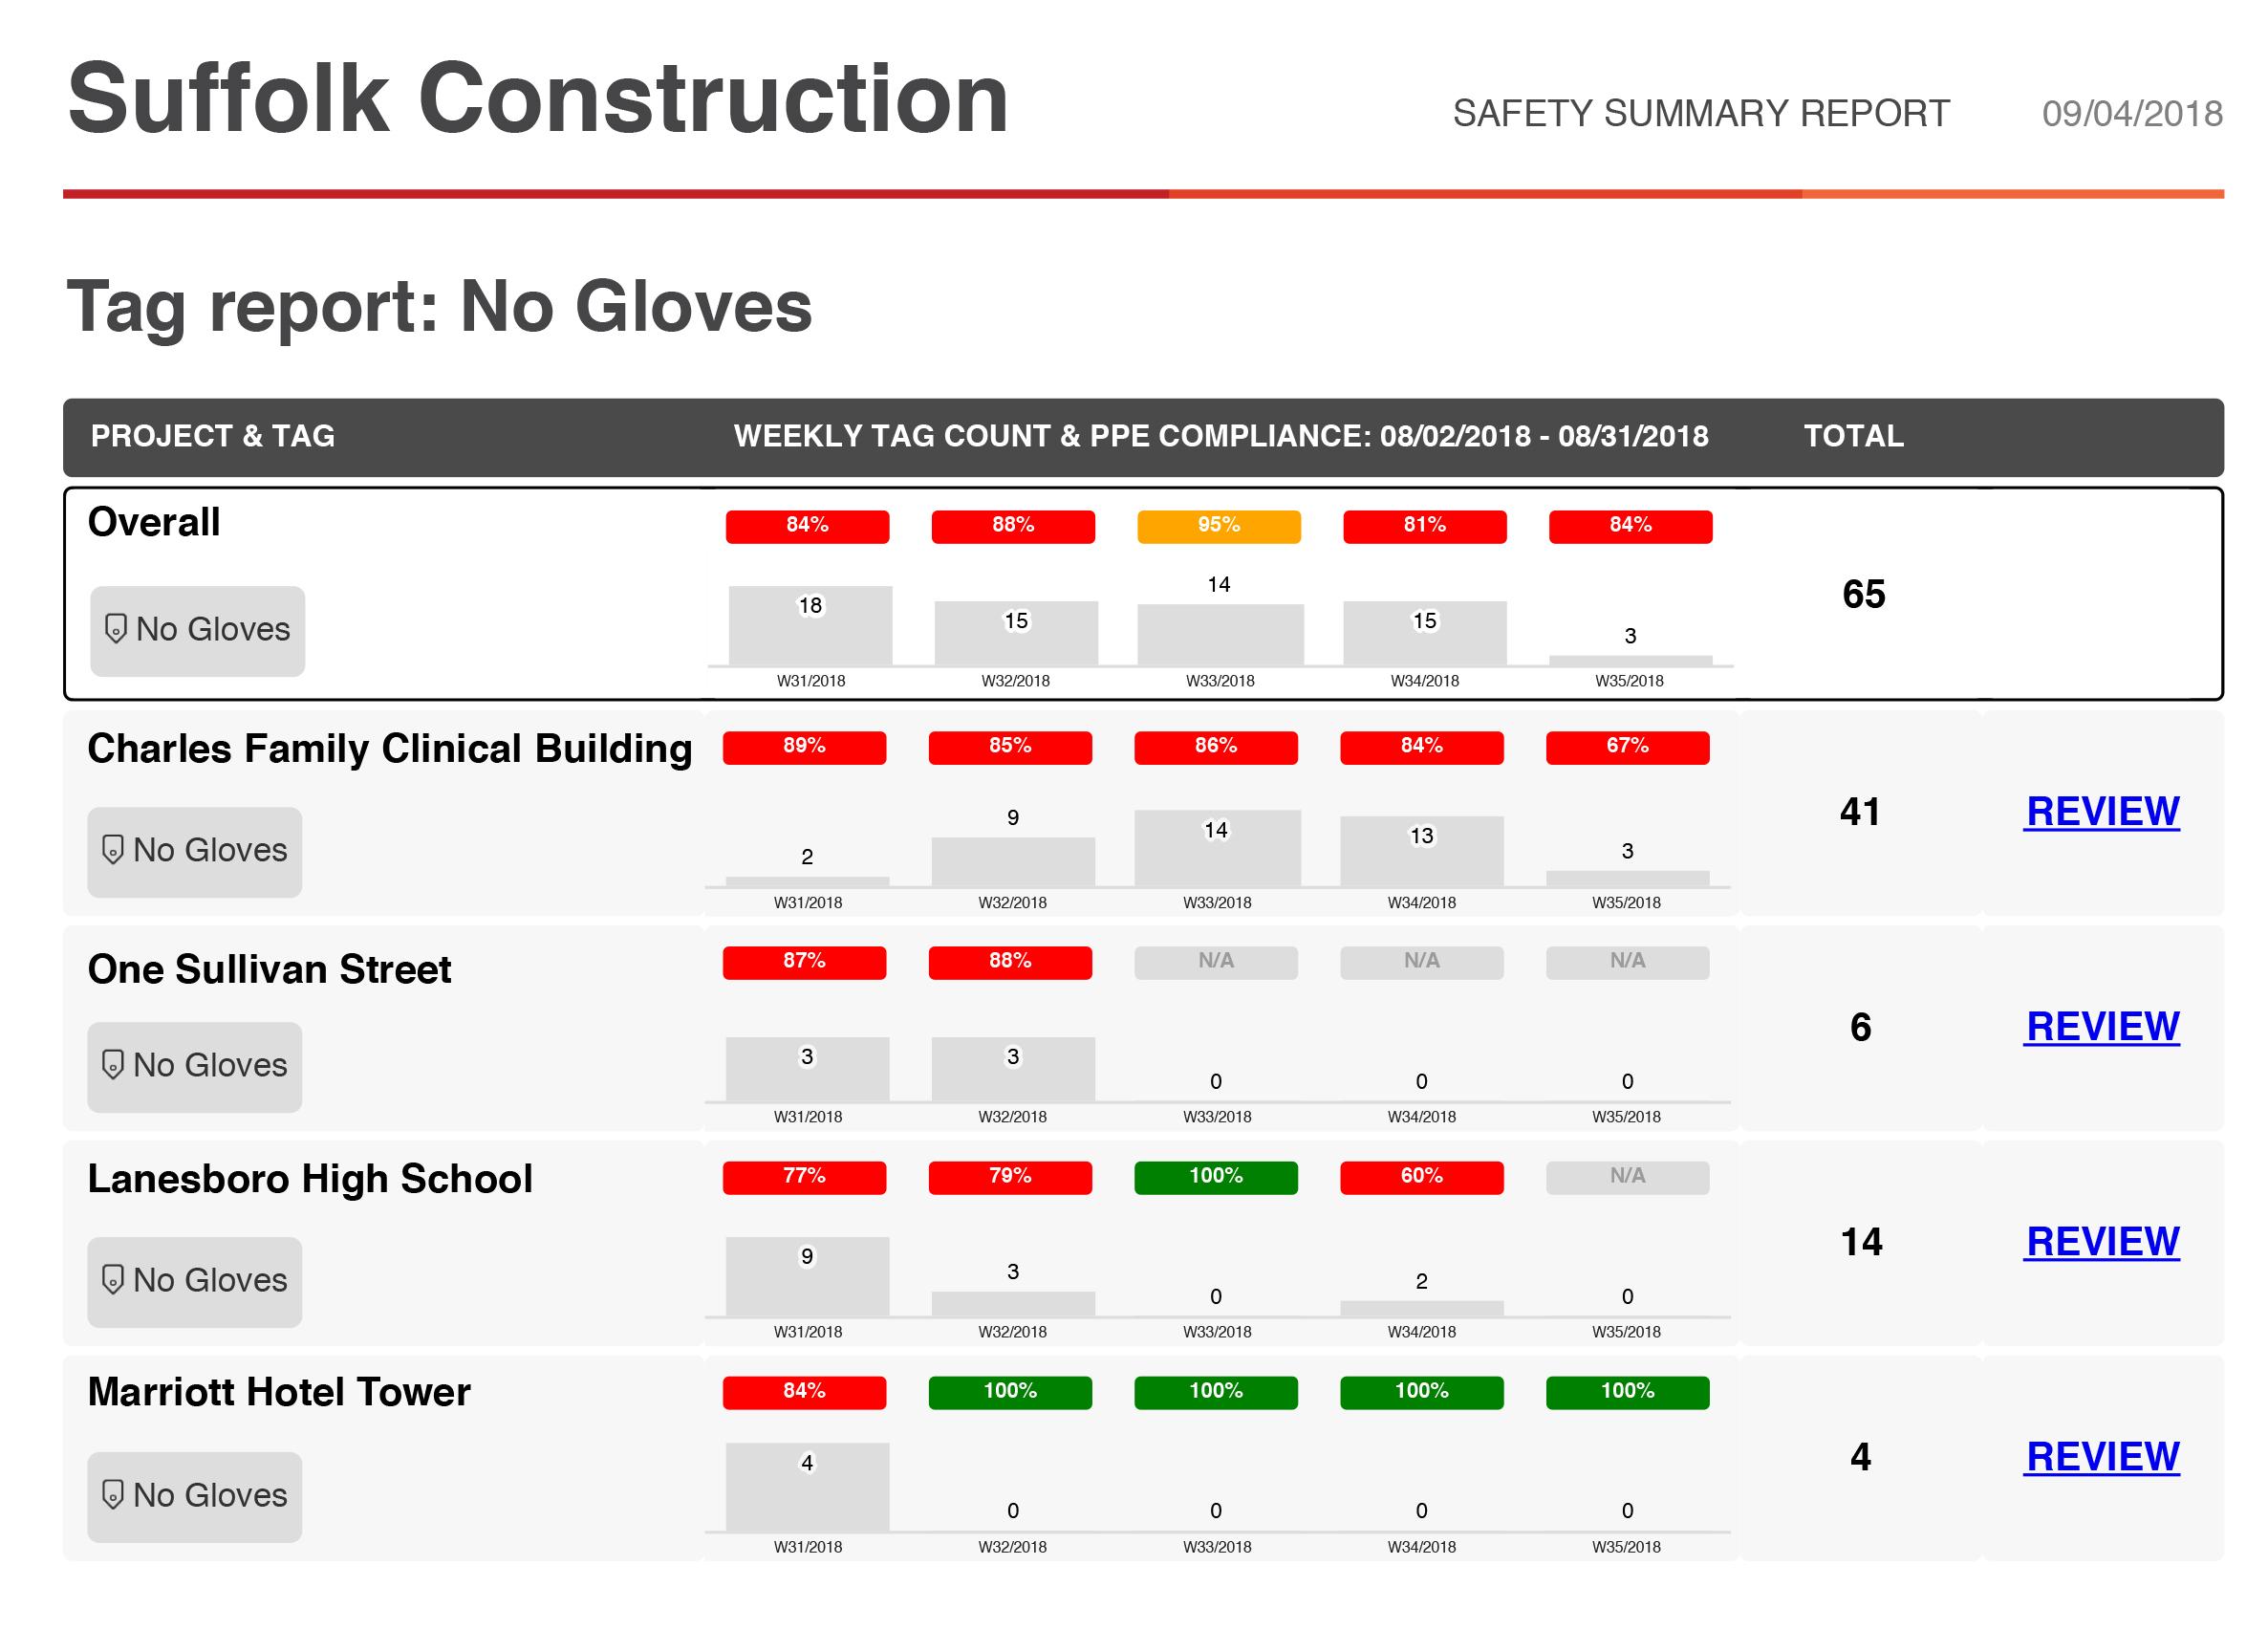 Safety summary report